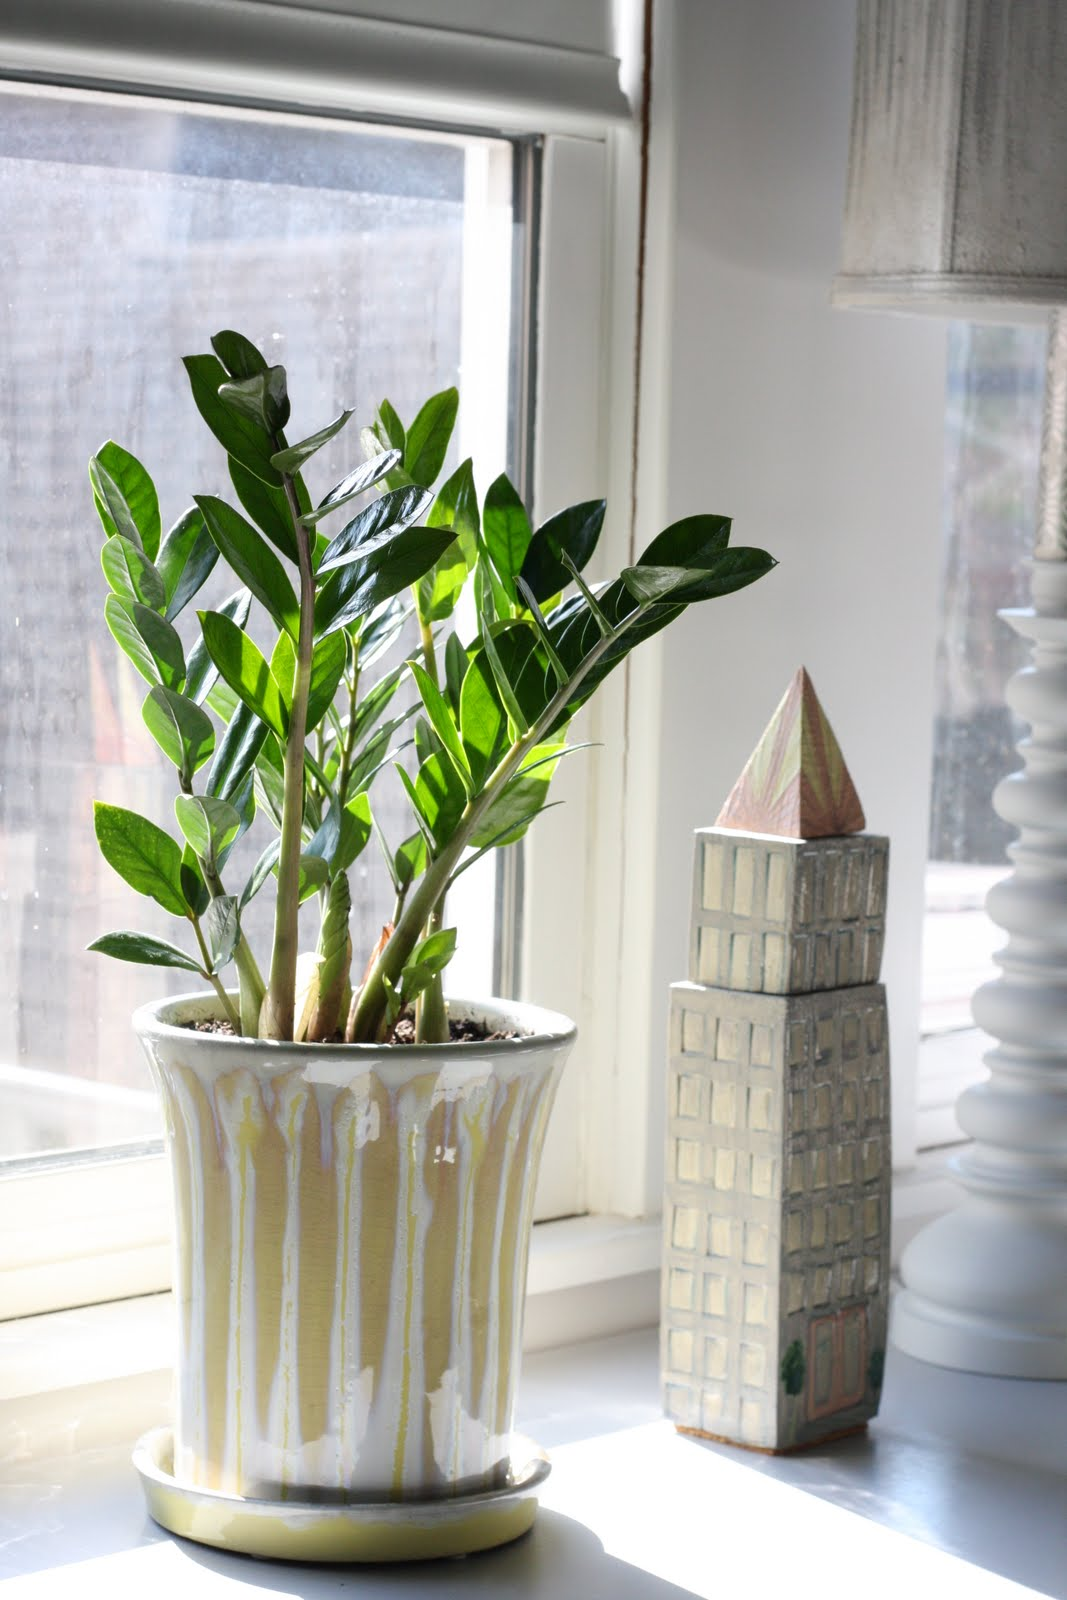 Замиокулькас на окне